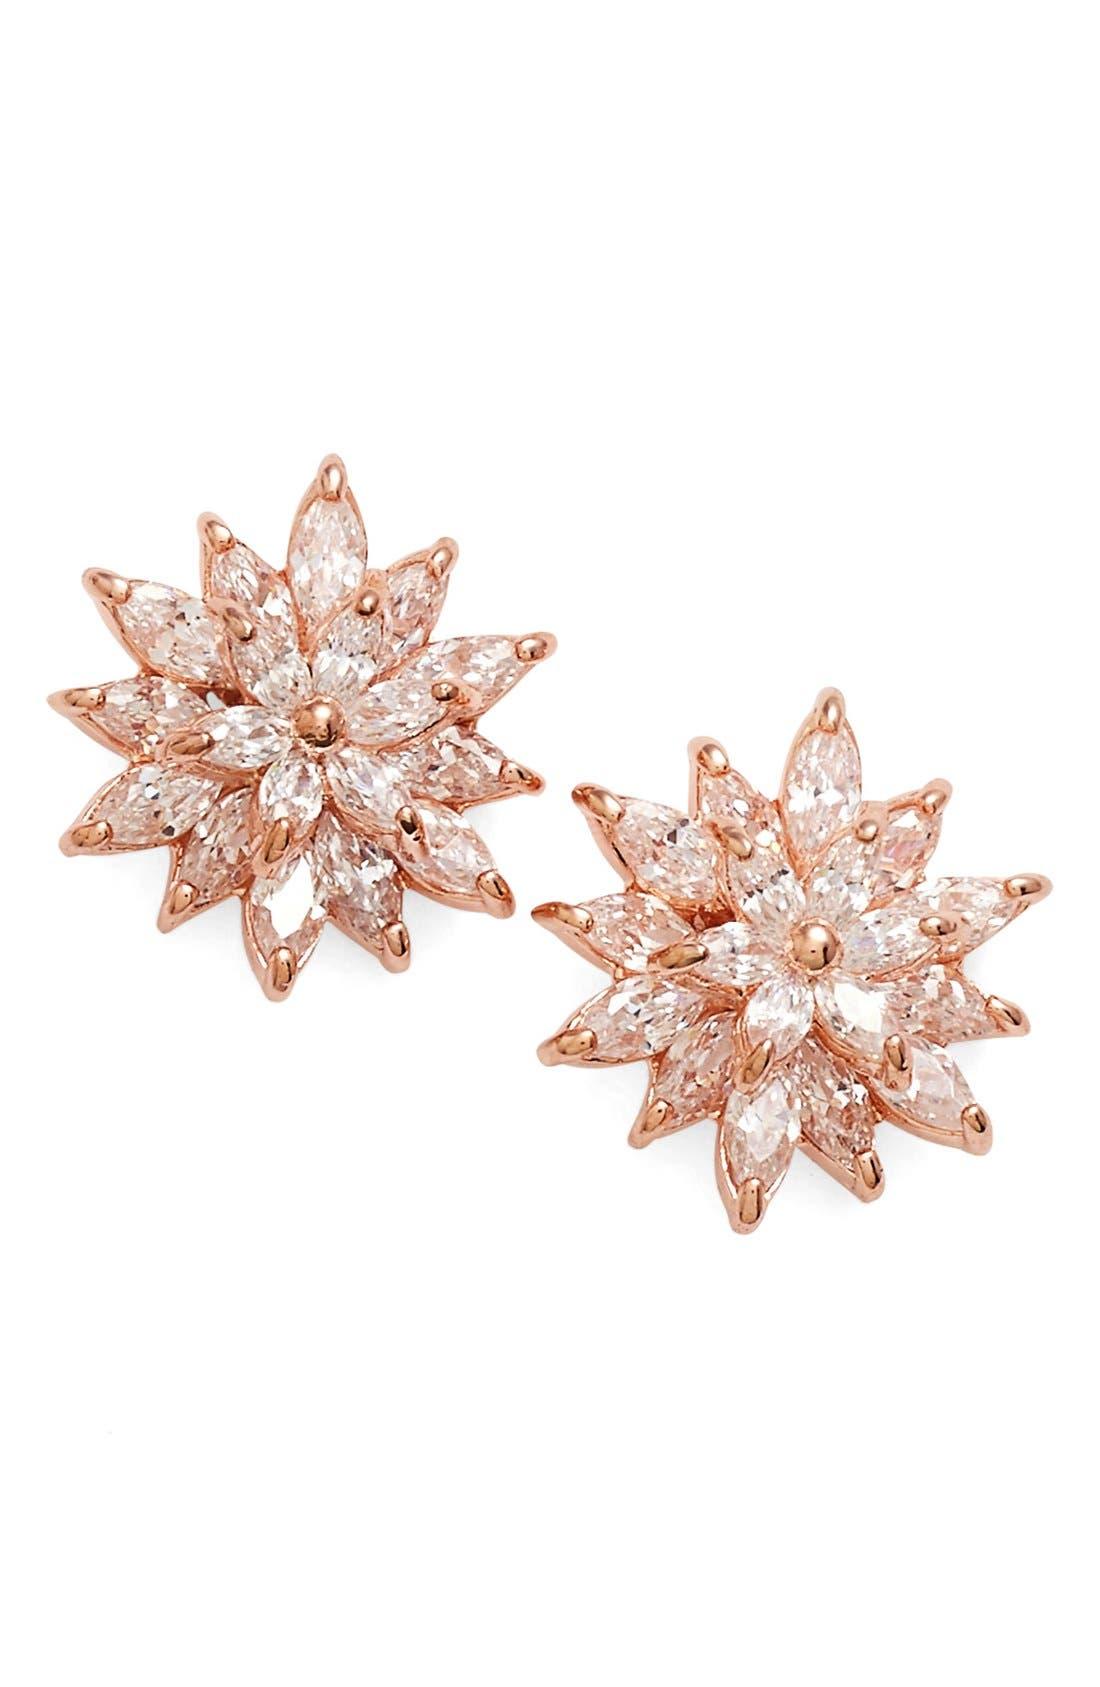 Main Image - Nina 'Flower' Crystal Stud Earrings